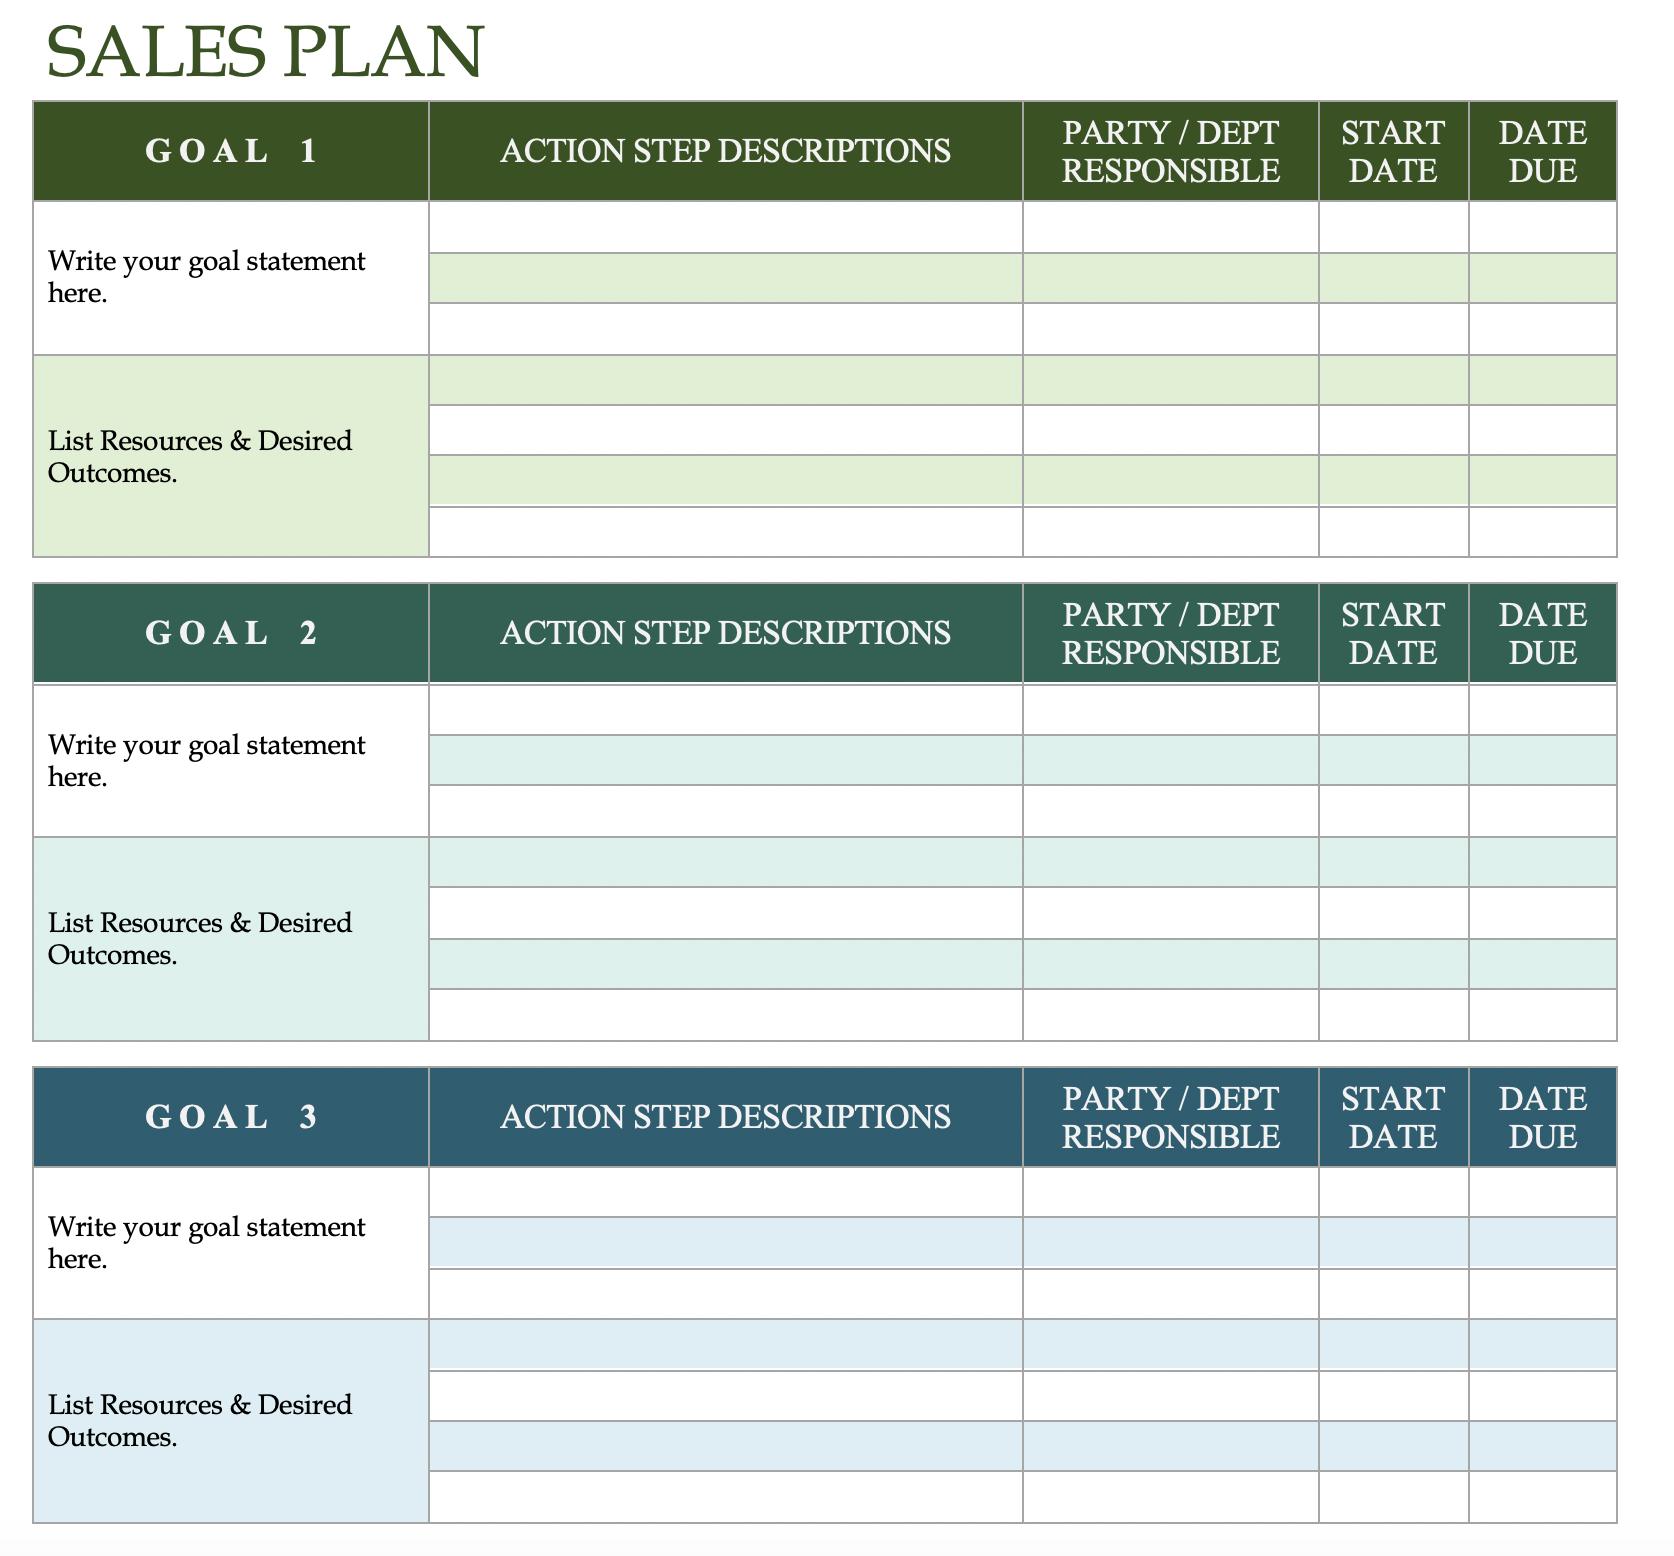 Strategic Sales Plans Examples: sales plan template